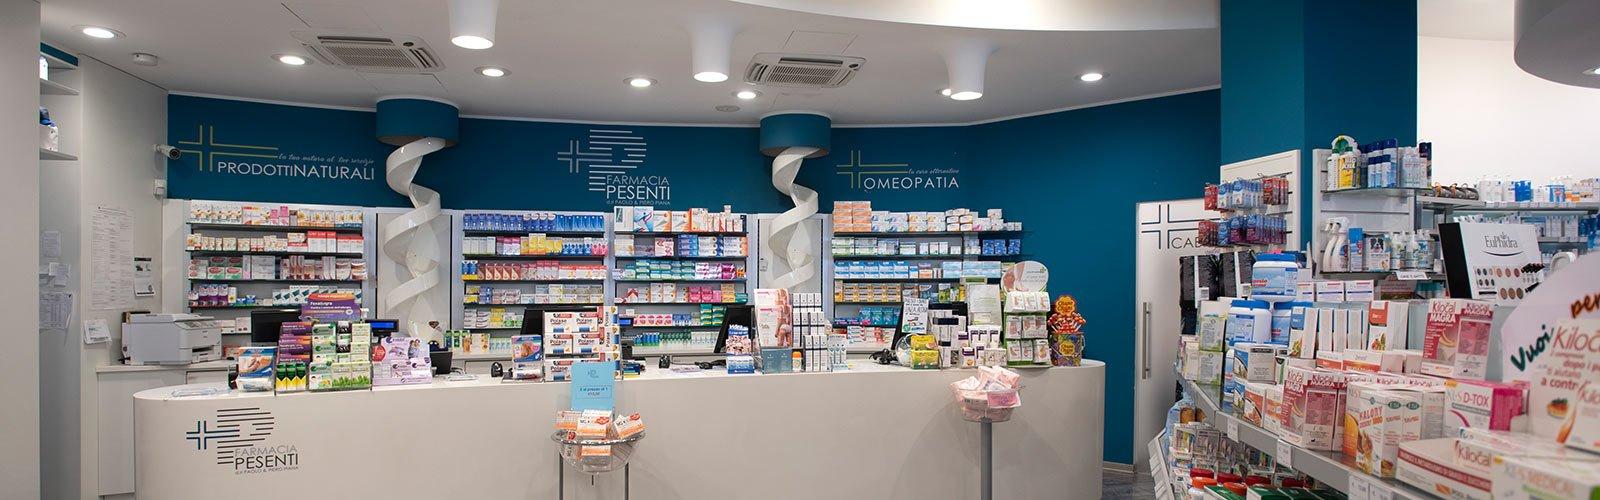 Farmacia Pesenti